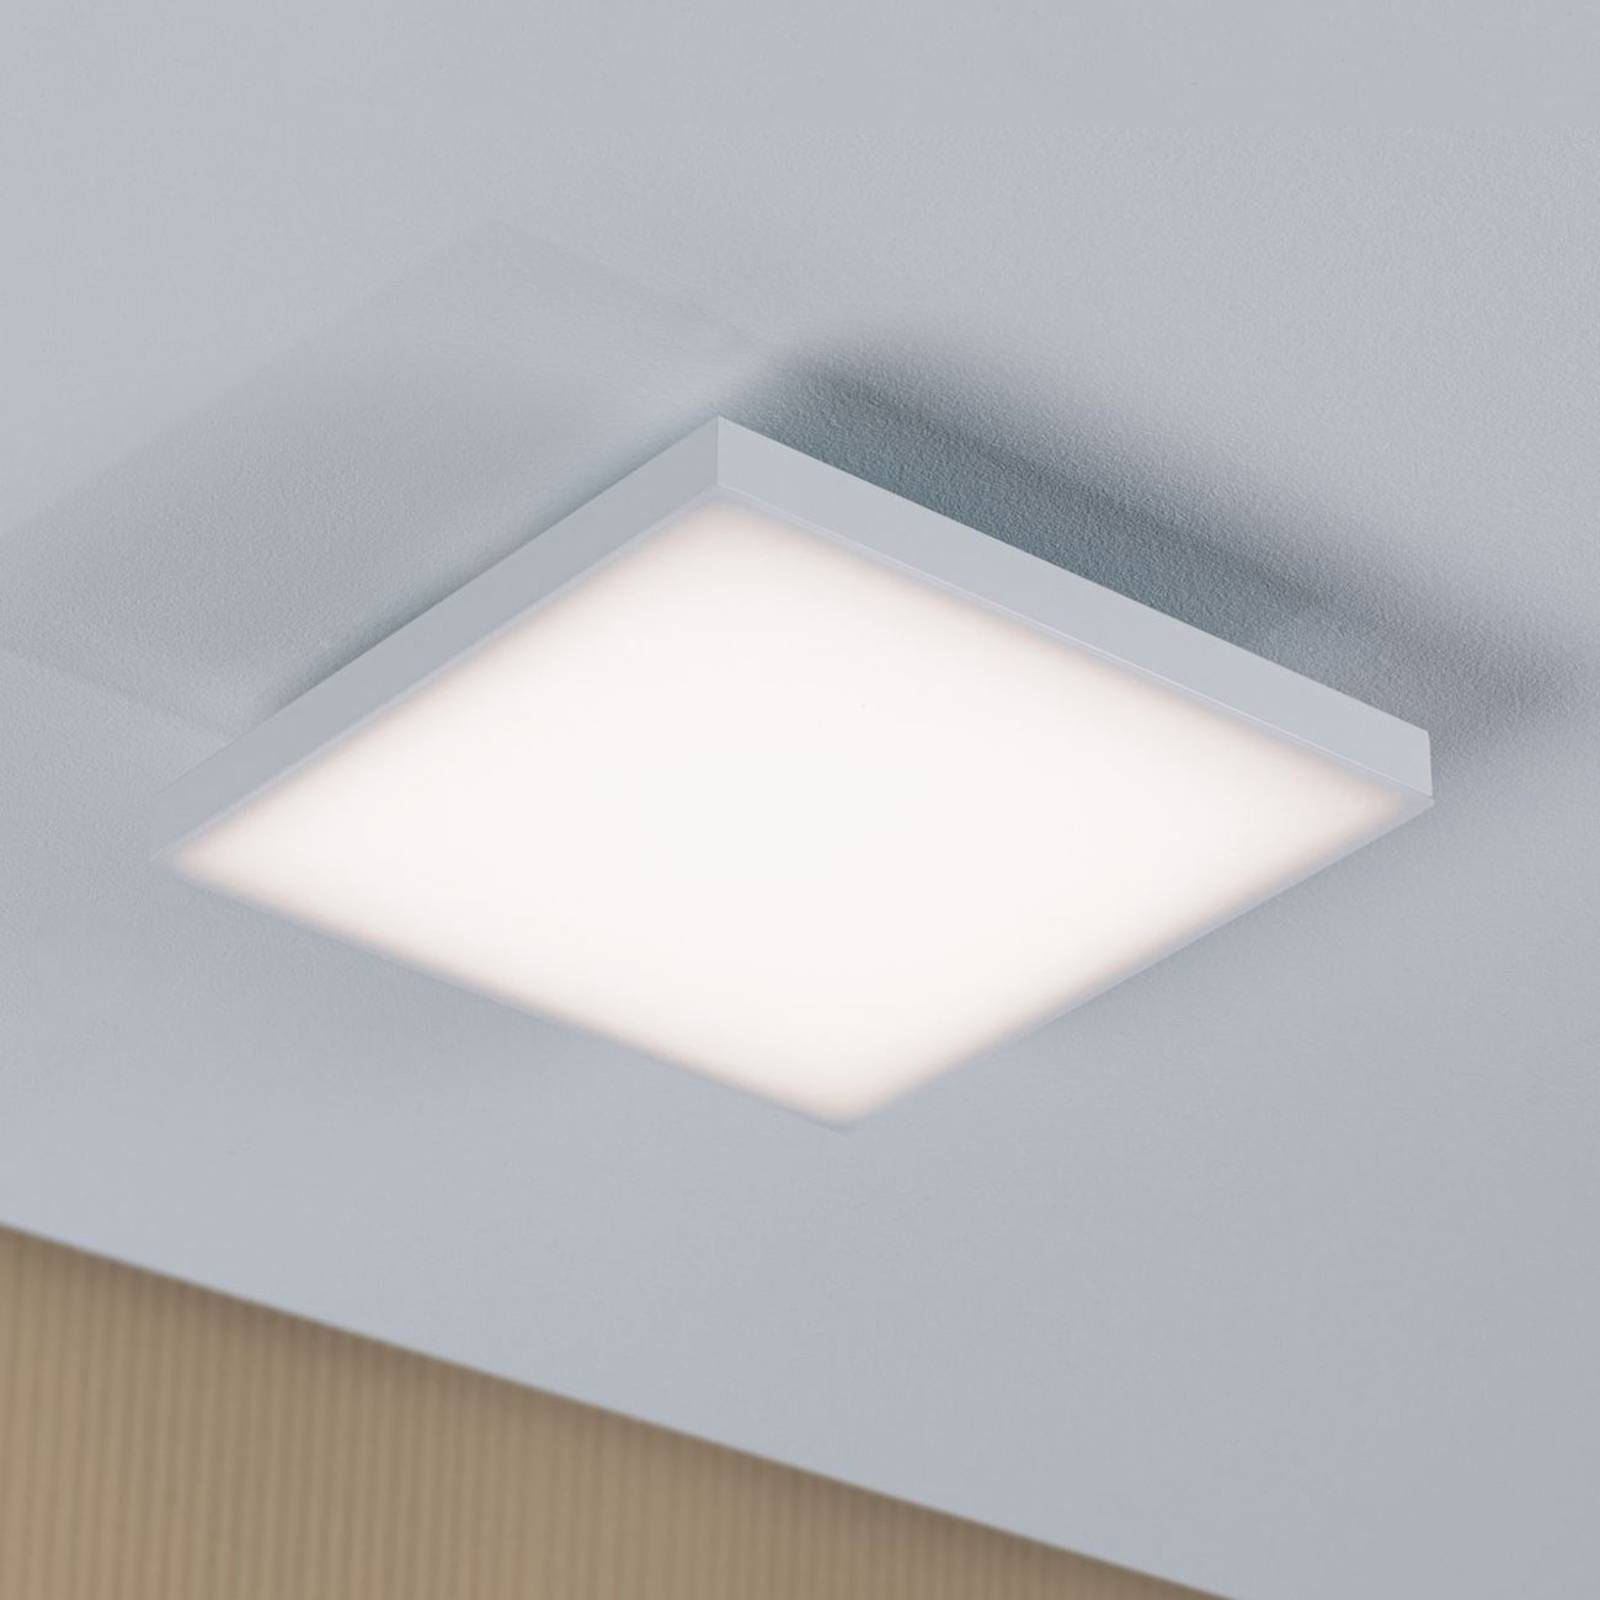 Paulmann Velora -LED-kattovalaisin 22,5 x 22,5 cm